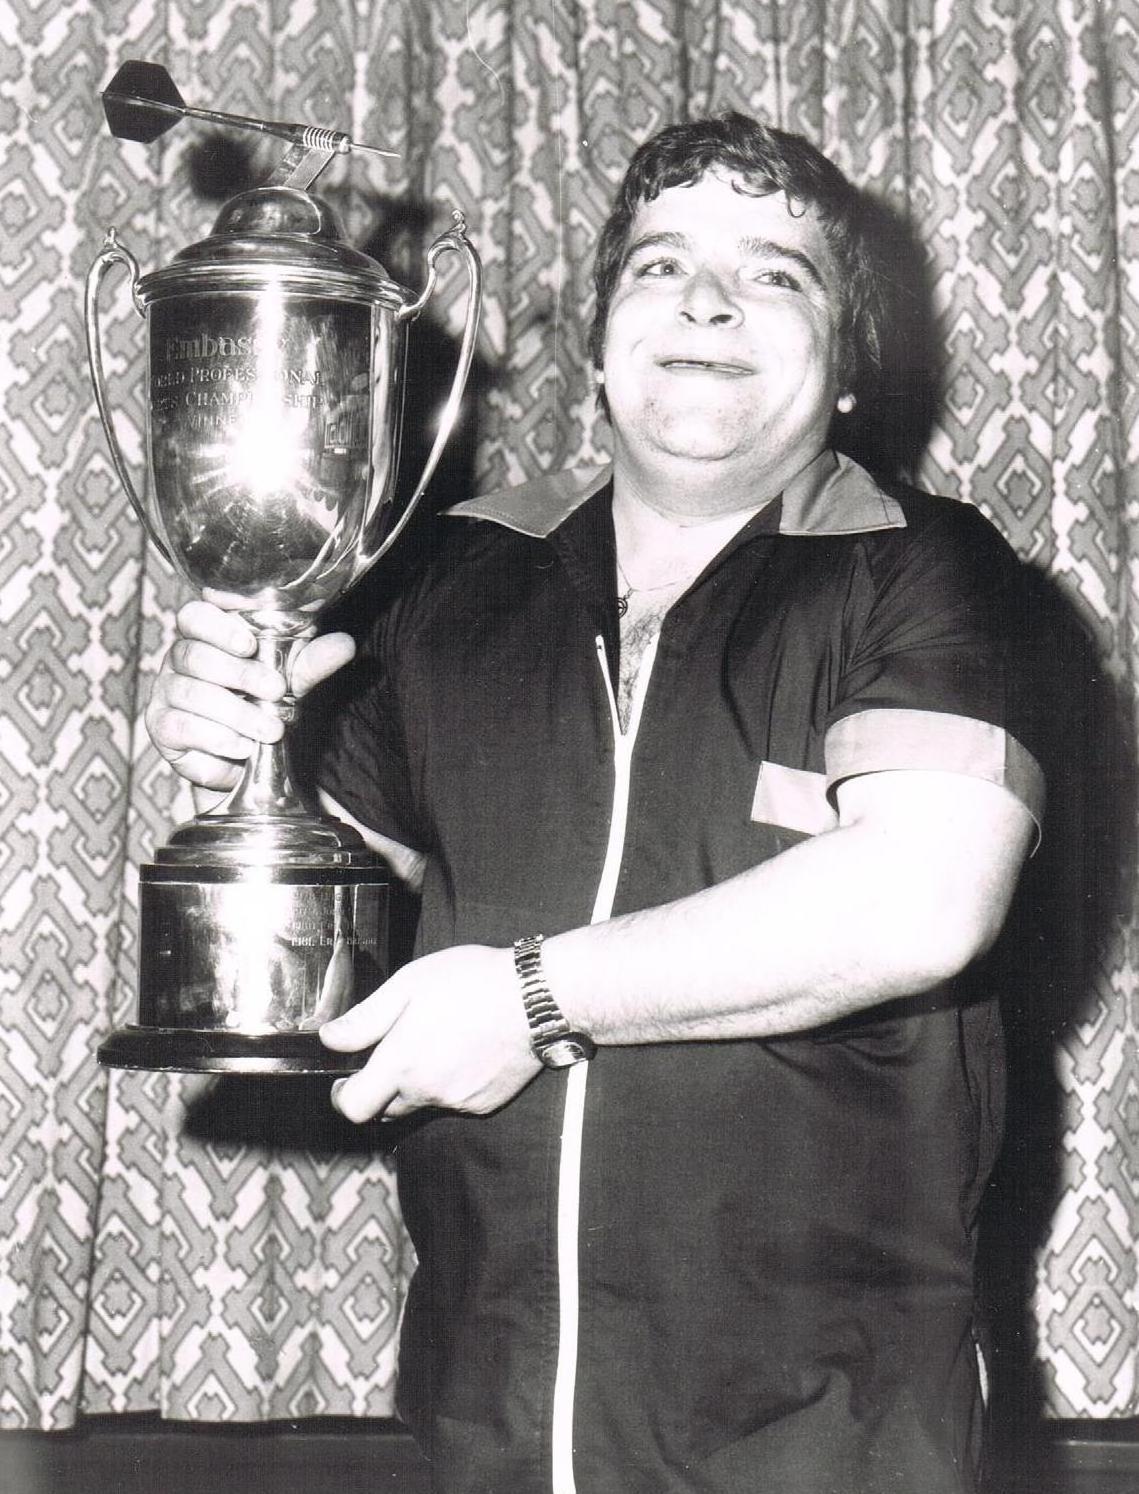 Jocky Wilson Cup